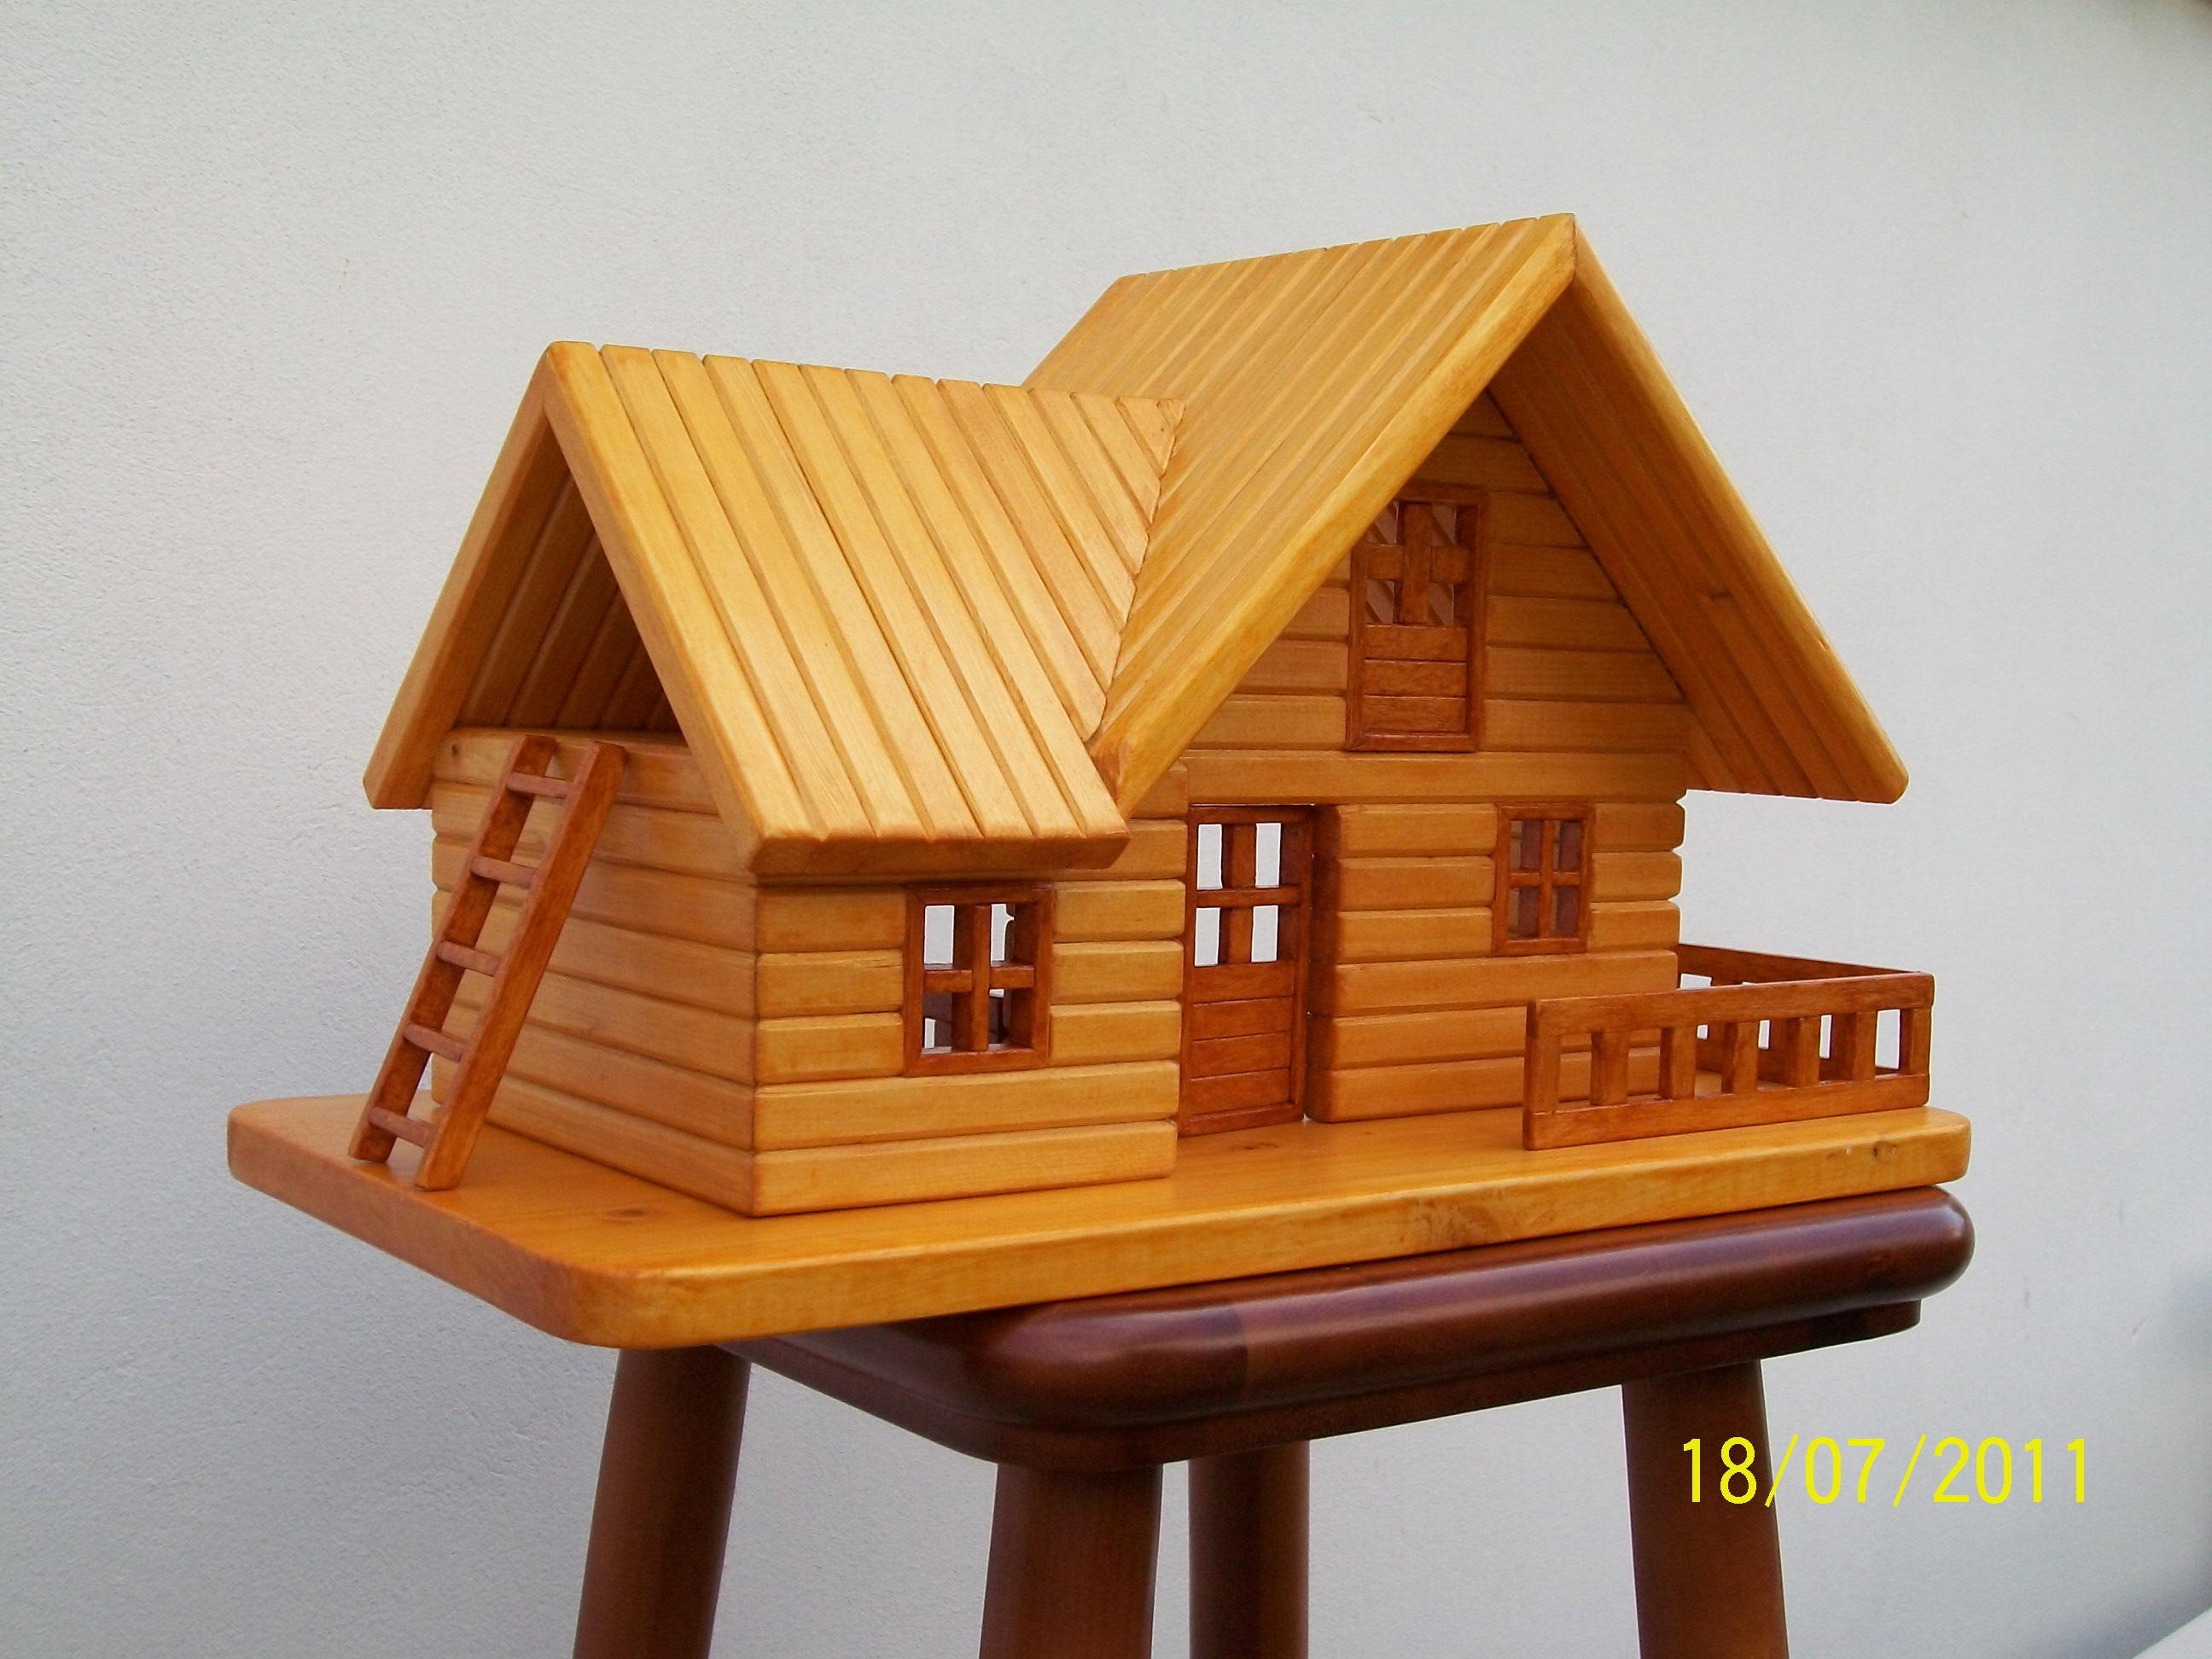 oggetti fai da te in legno vp07 regardsdefemmes